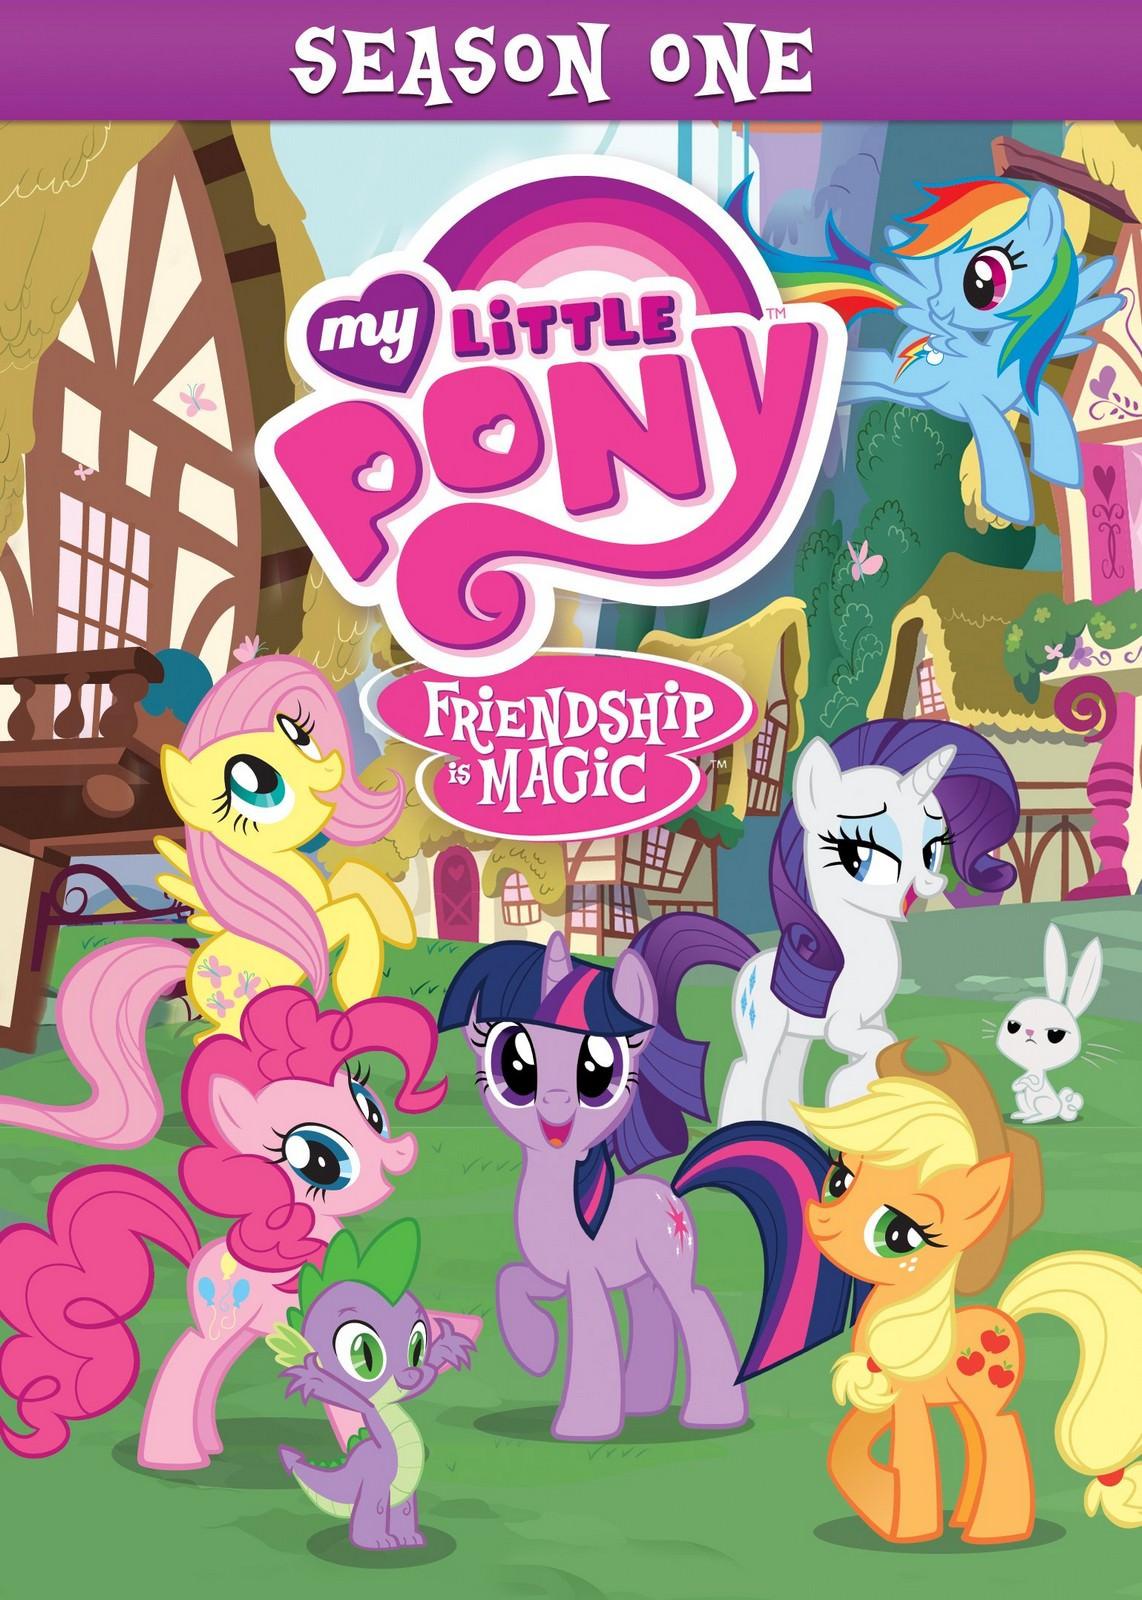 tv series, My Little Pony: Friendship Is Magic(美國.加拿大) / 彩虹小馬(台) / 小马宝莉(中) / 小馬寶莉(港), 封面